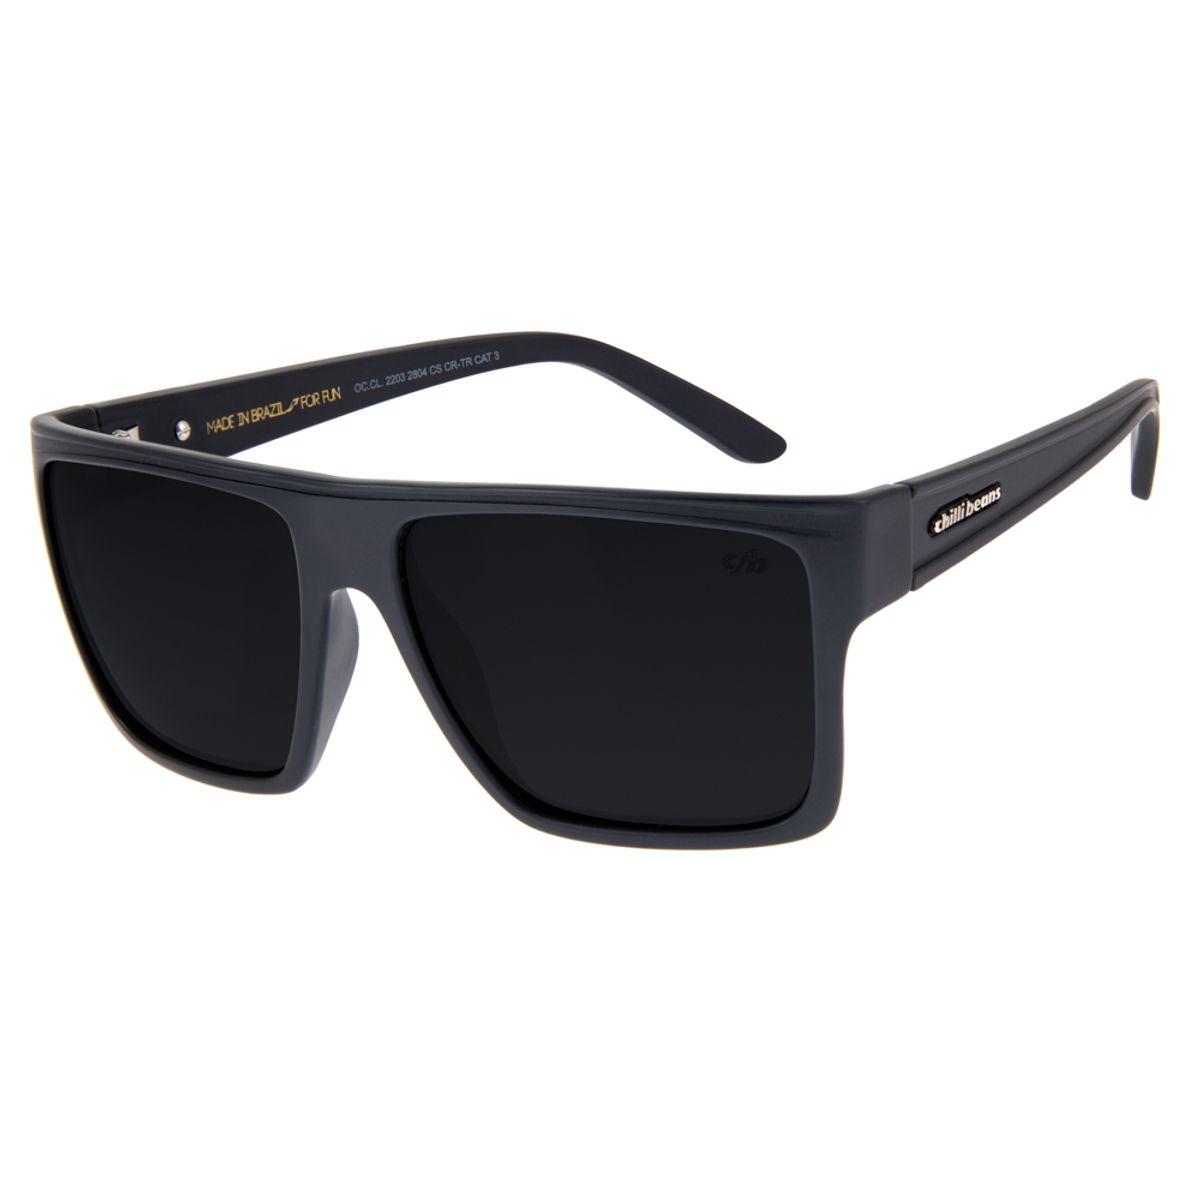 fcec67b9a Óculos De Sol Chilli Beans Unissex Quadrado Cinza Polarizado 2203 ...